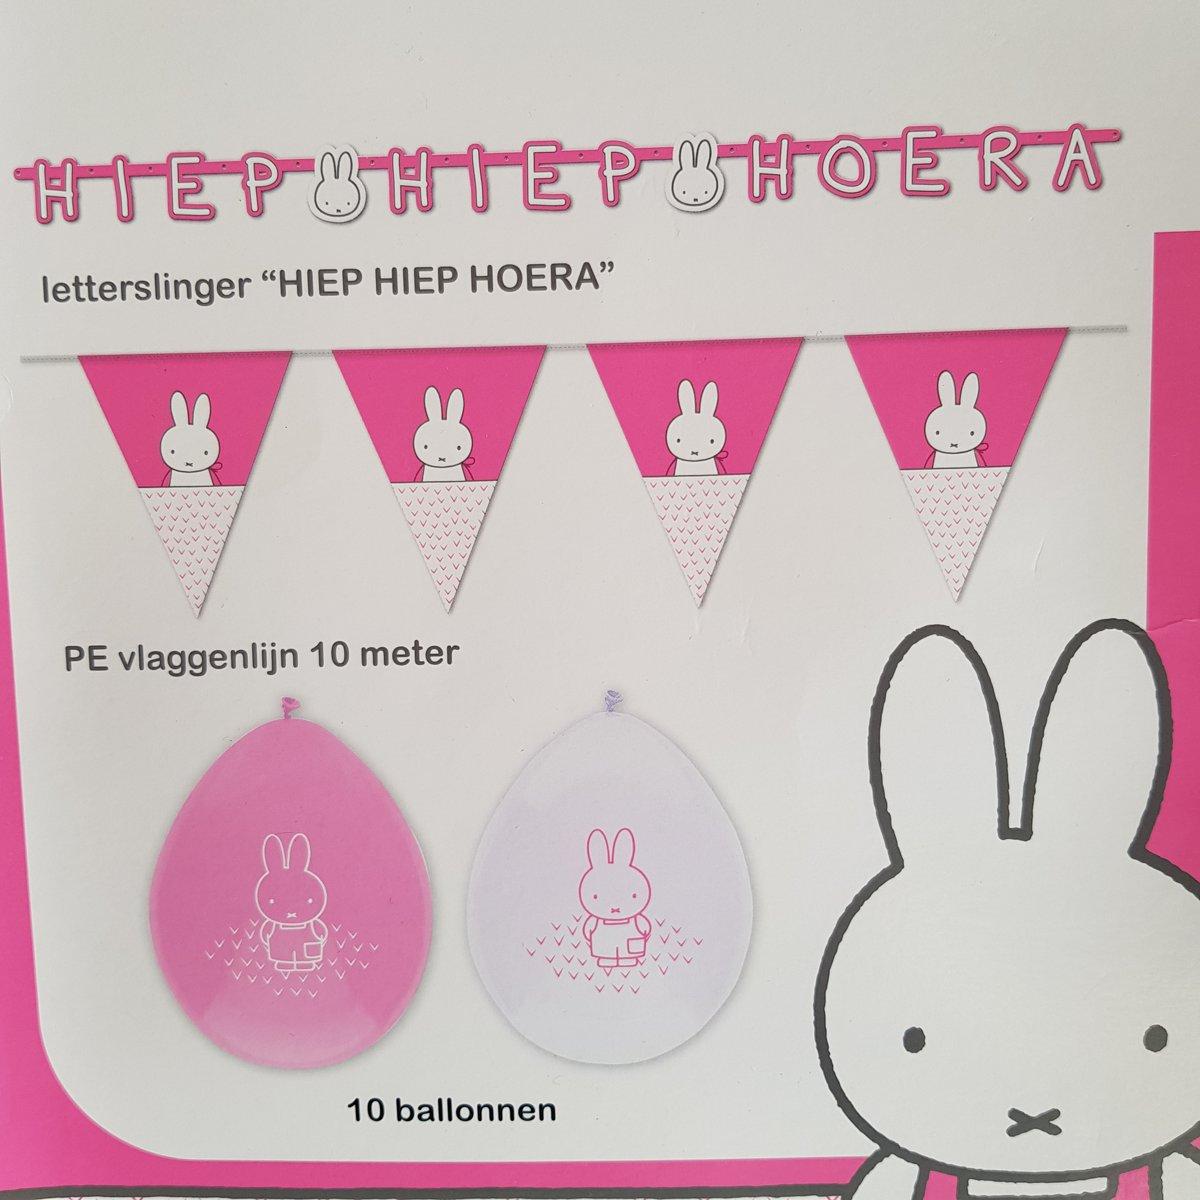 Nijntje Feestpakket Roze, 12-delig, 10 ballonnen, 10 meter vlaggenlijn en letterslinger